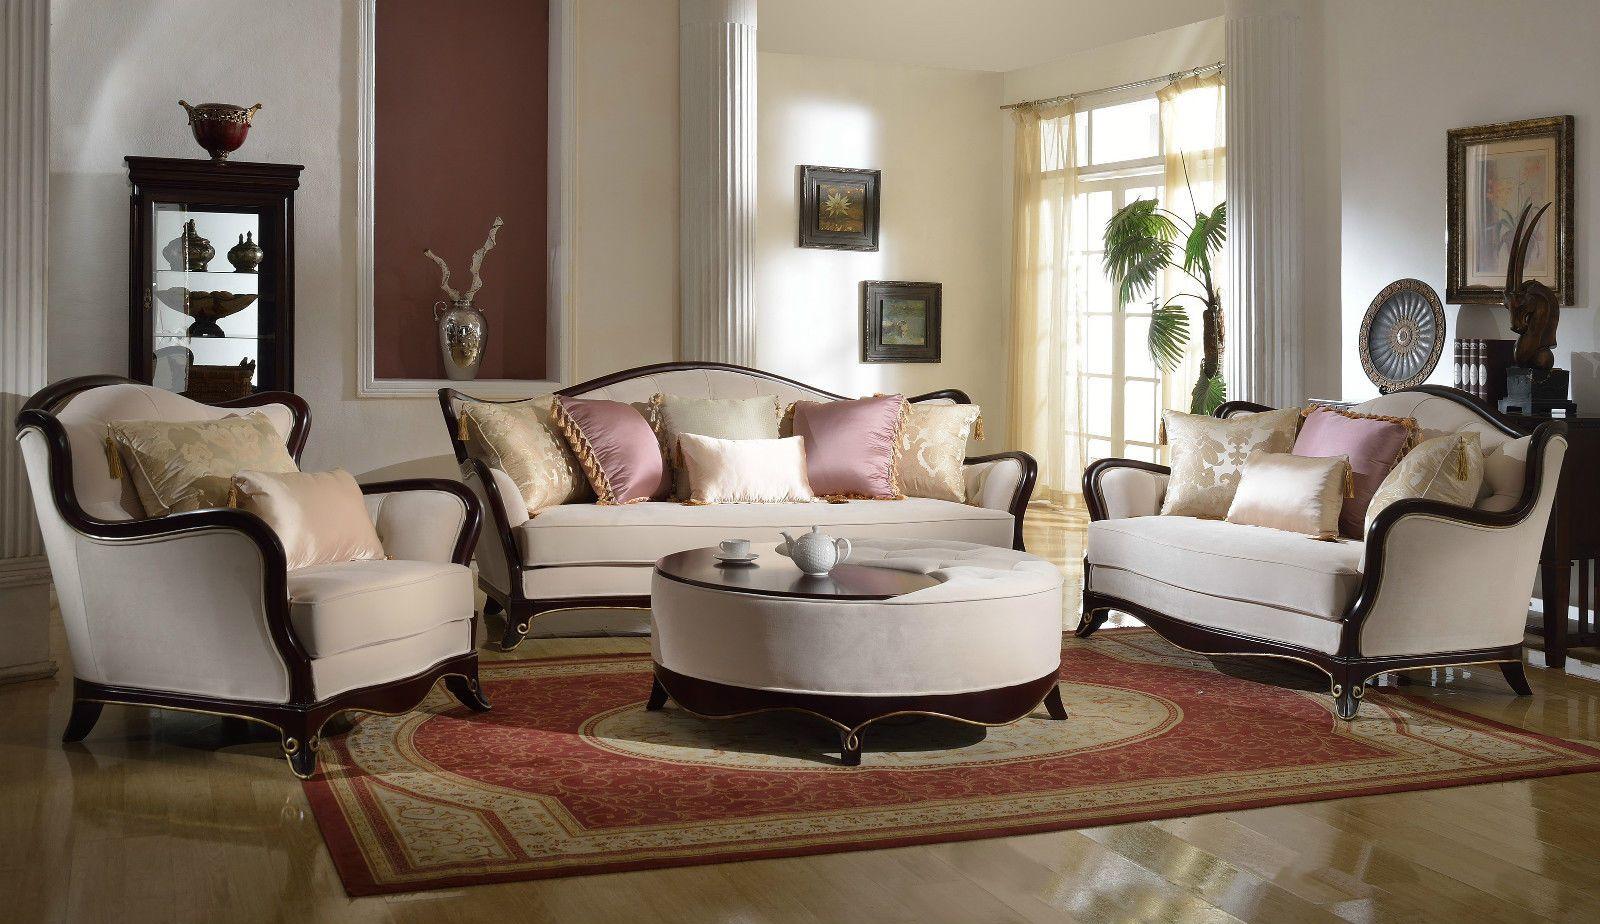 French Provincial Formal Living Room Furniture Set Sofa Loveseat Exposed Wood   eBay